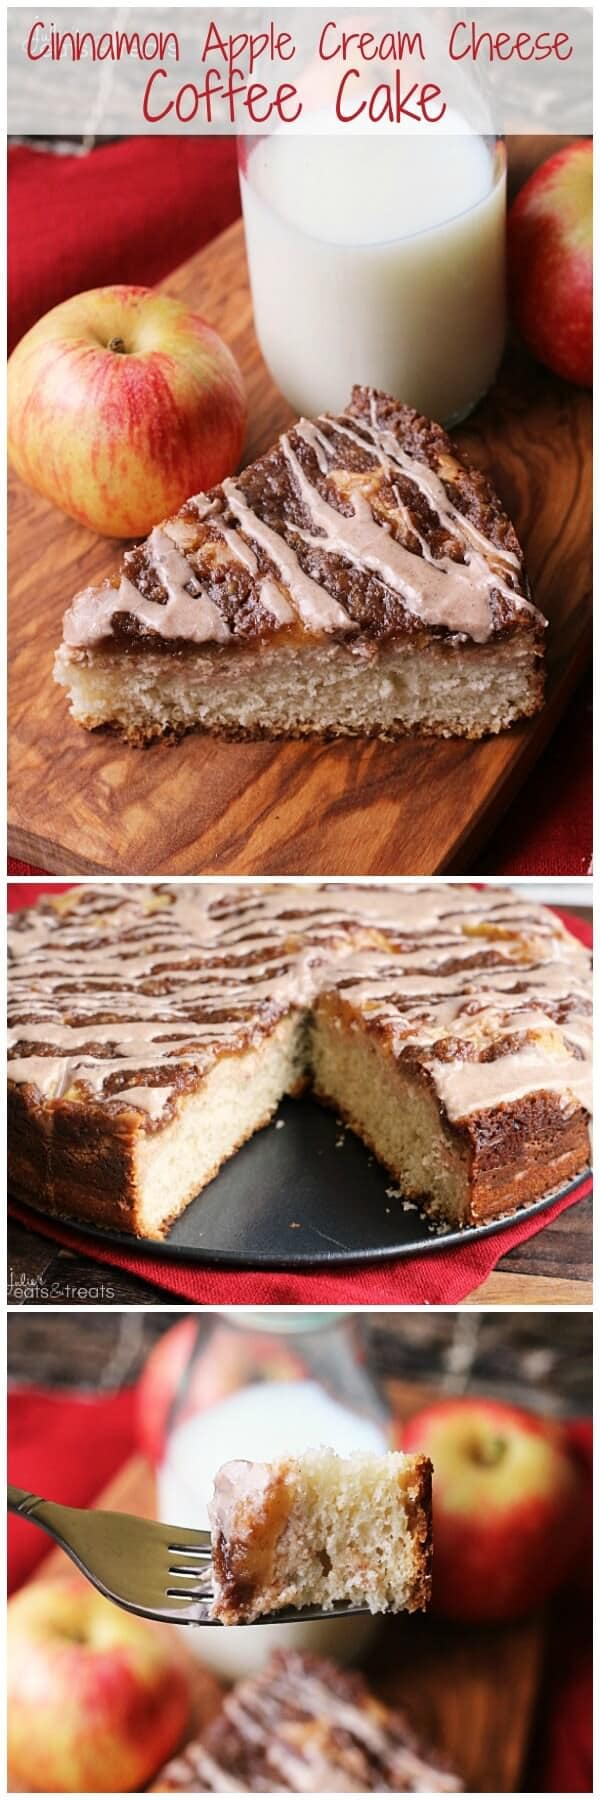 Cinnamon Apple Cream Cheese Coffee Cake ~ Amazing Coffee Cake Topped with Cream Cheese, Apples, Crumb Topping and Cinnamon Glaze!